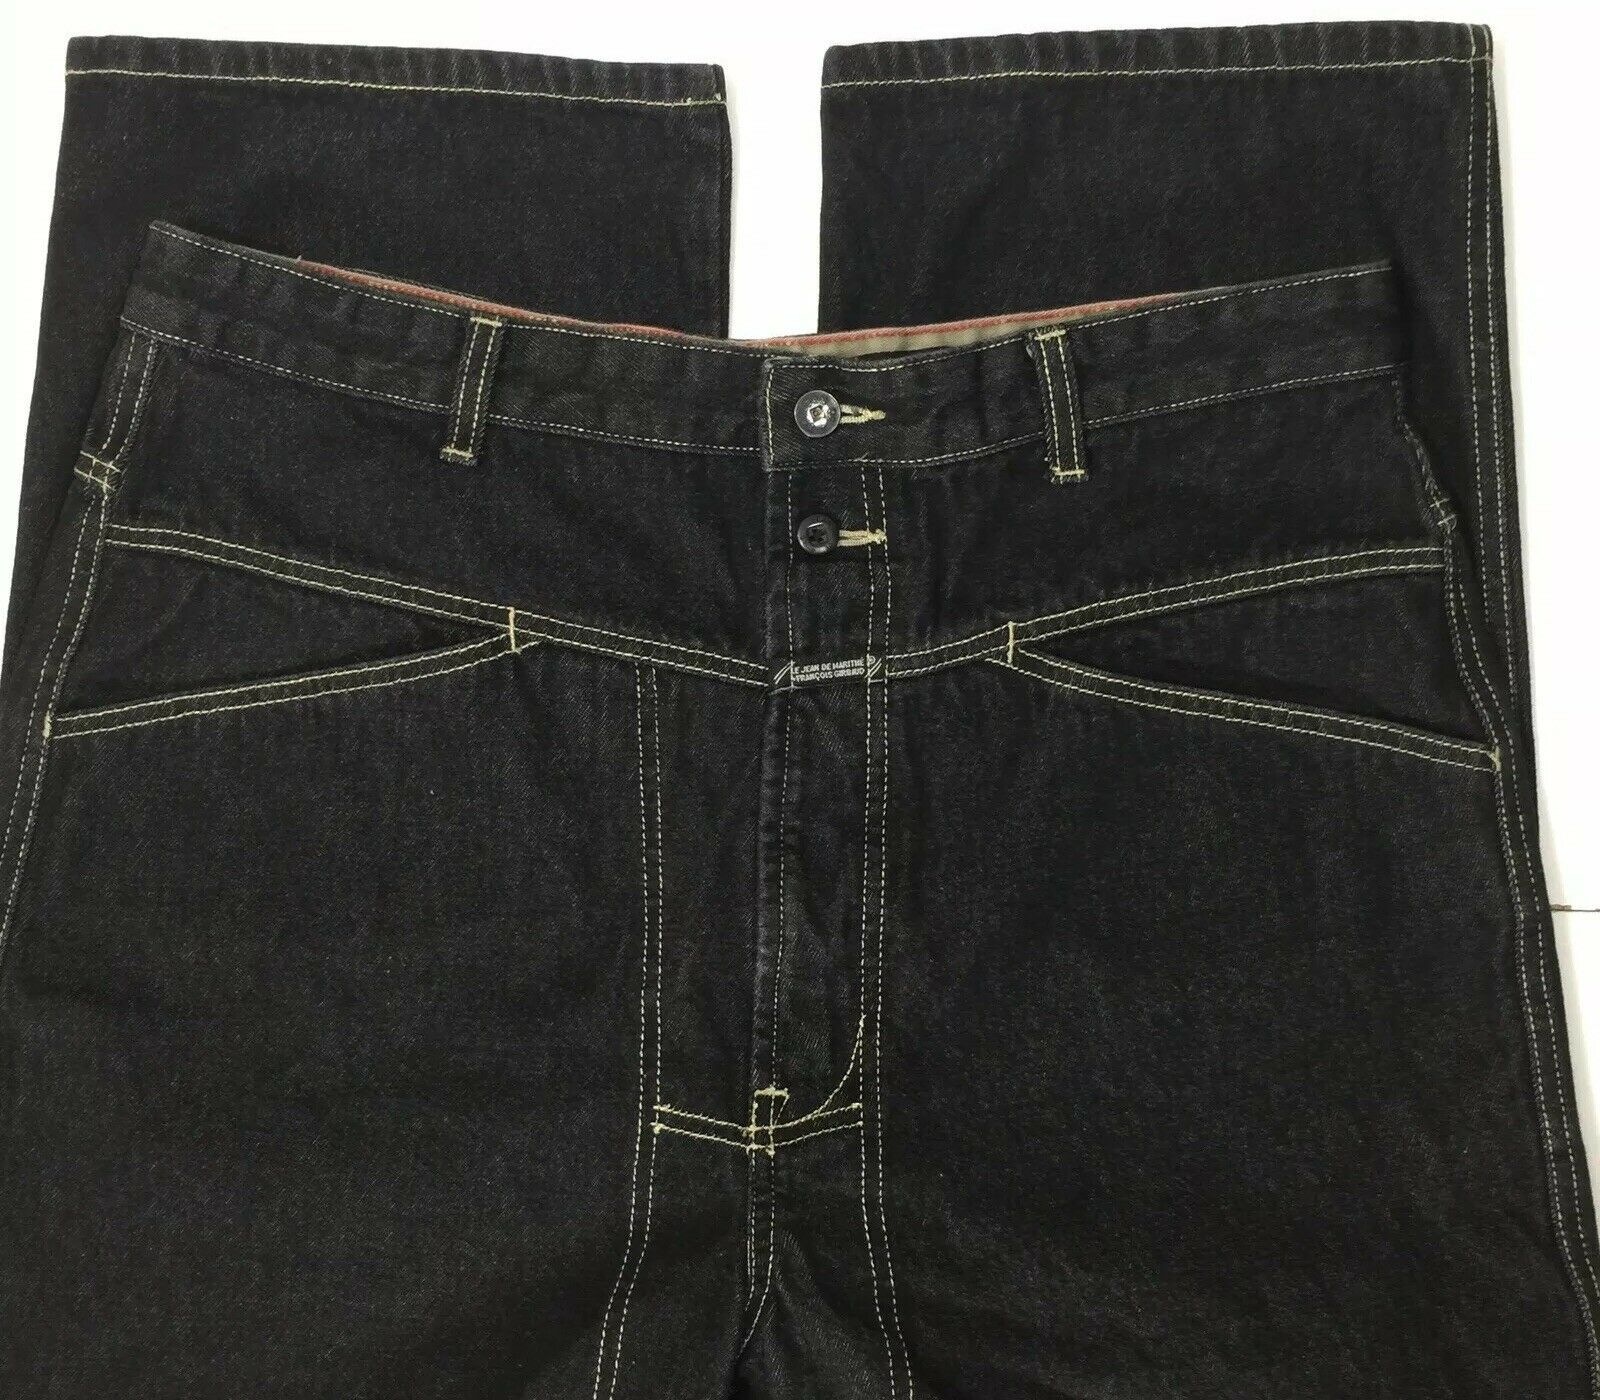 Marithe Francios Girbaud Jeans Mens 36x32 Dark Black Mfg Hip Hop Baggy Street Ebay Mens Jeans Hip Hop Jeans Girbaud Jeans